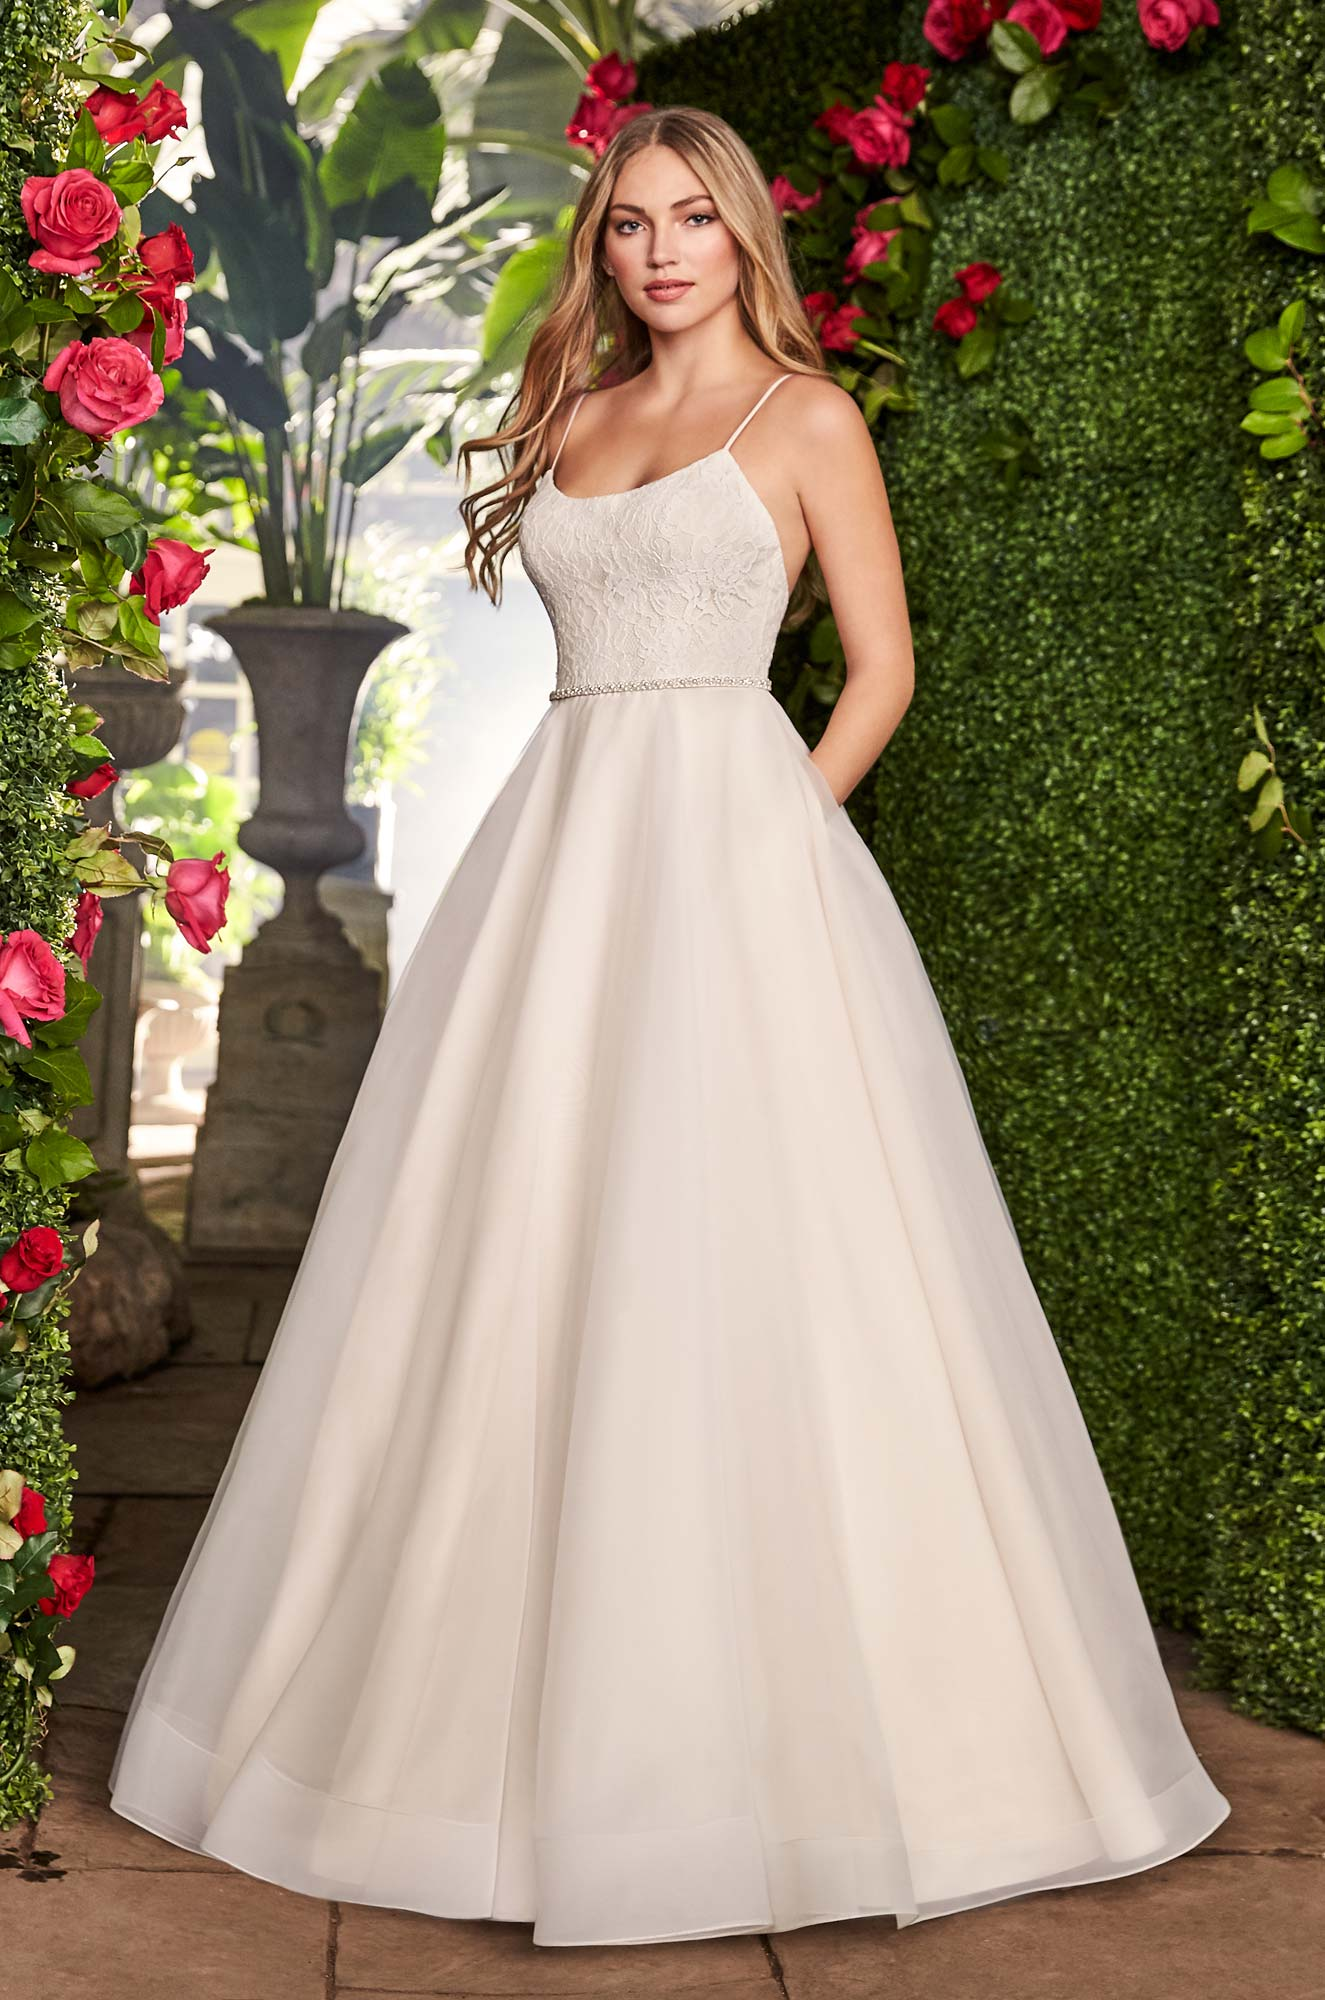 Scoop Neckline Wedding Dress – Style #2256 | Mikaella Bridal